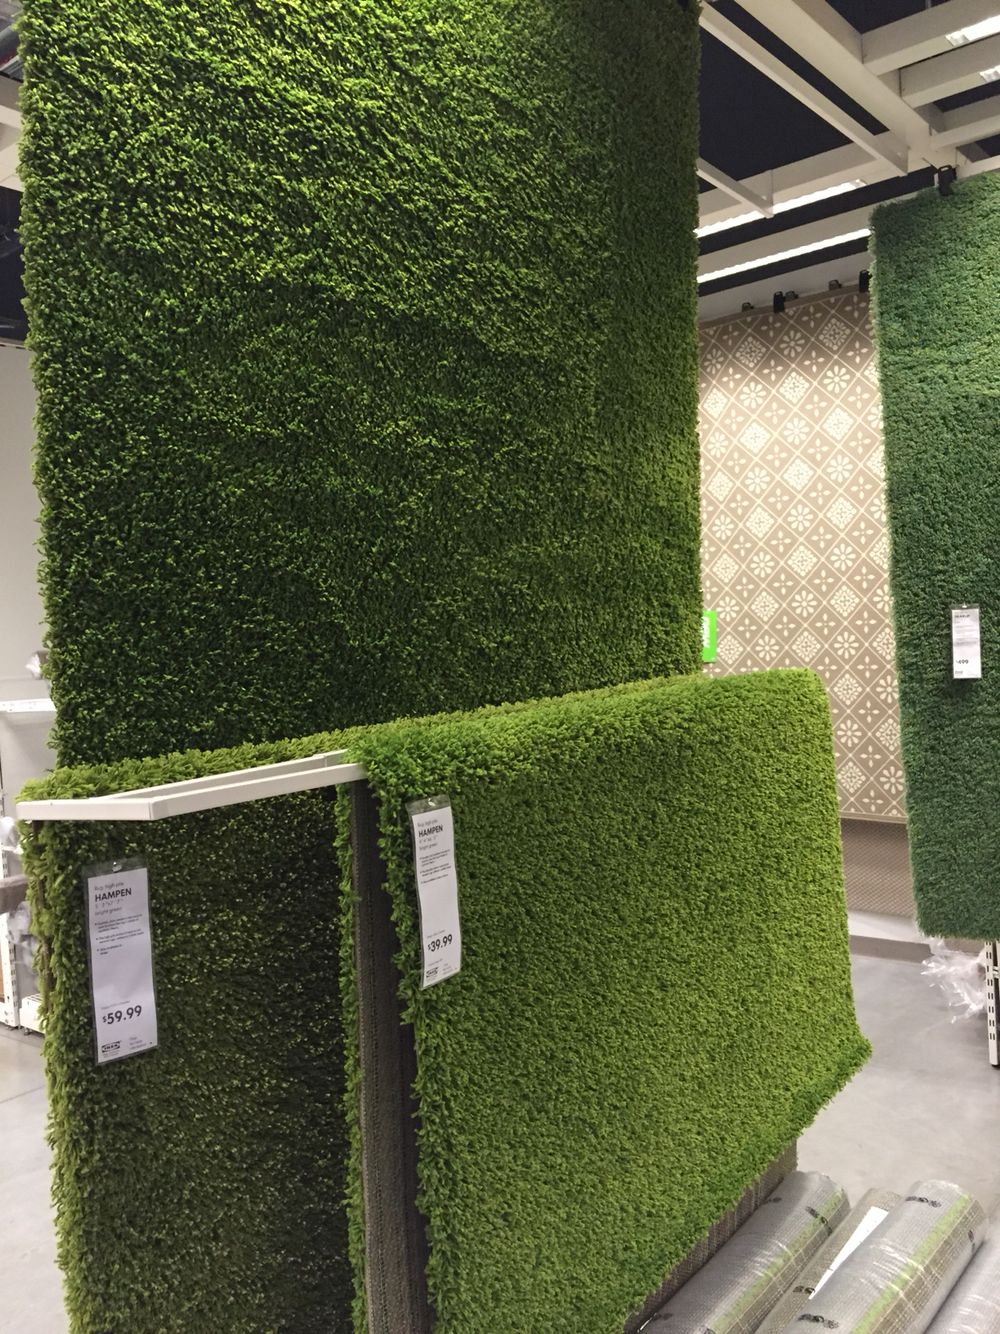 Grass Or An Ikea Rug Grass Backdrops Wall Backdrops Diy Backdrop